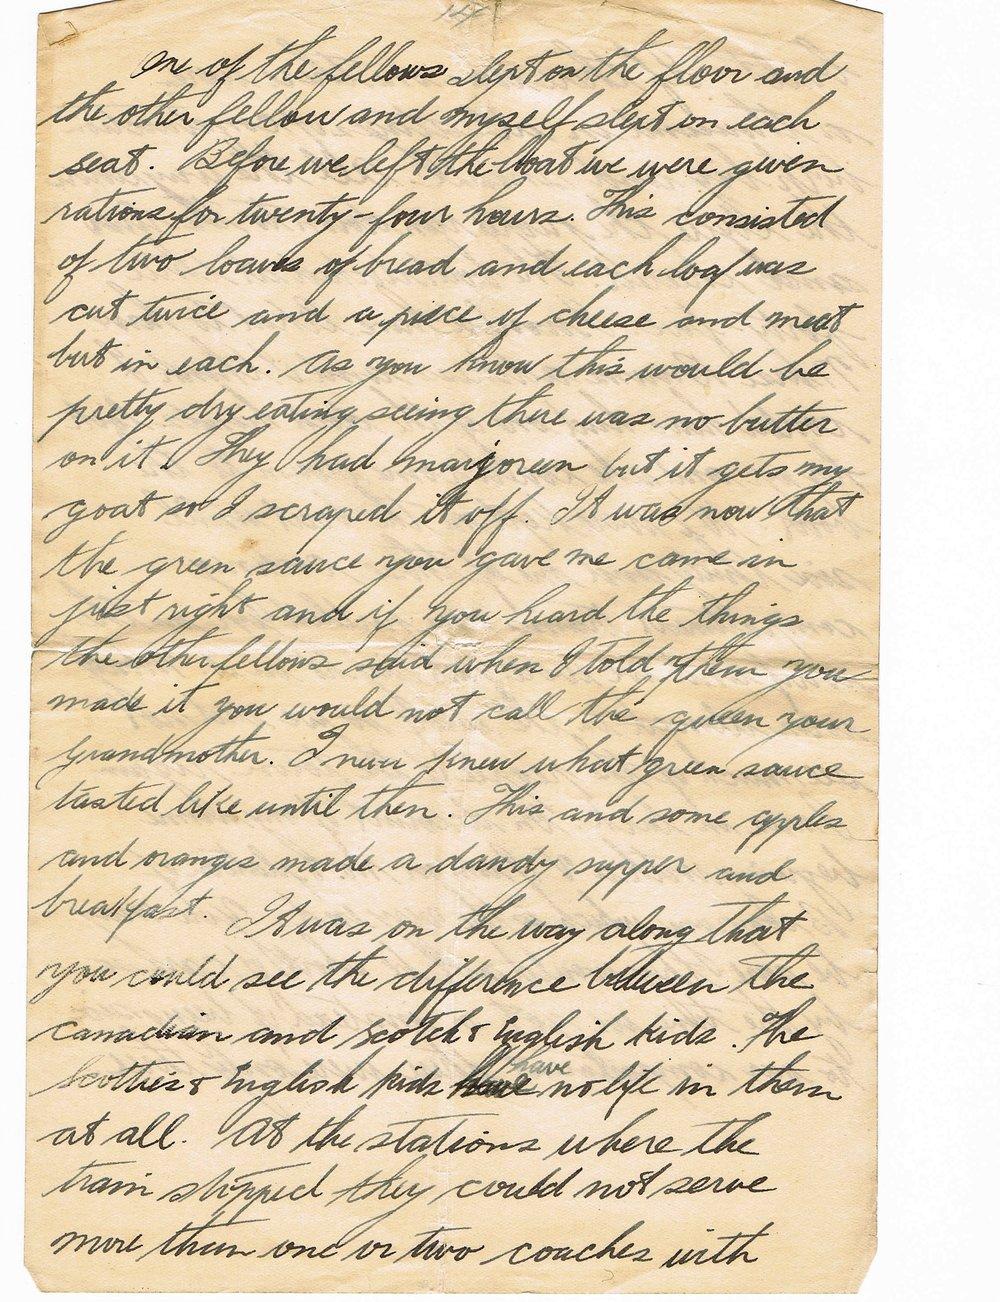 Basil Vale January 2, 1918 letter - page 14.jpg